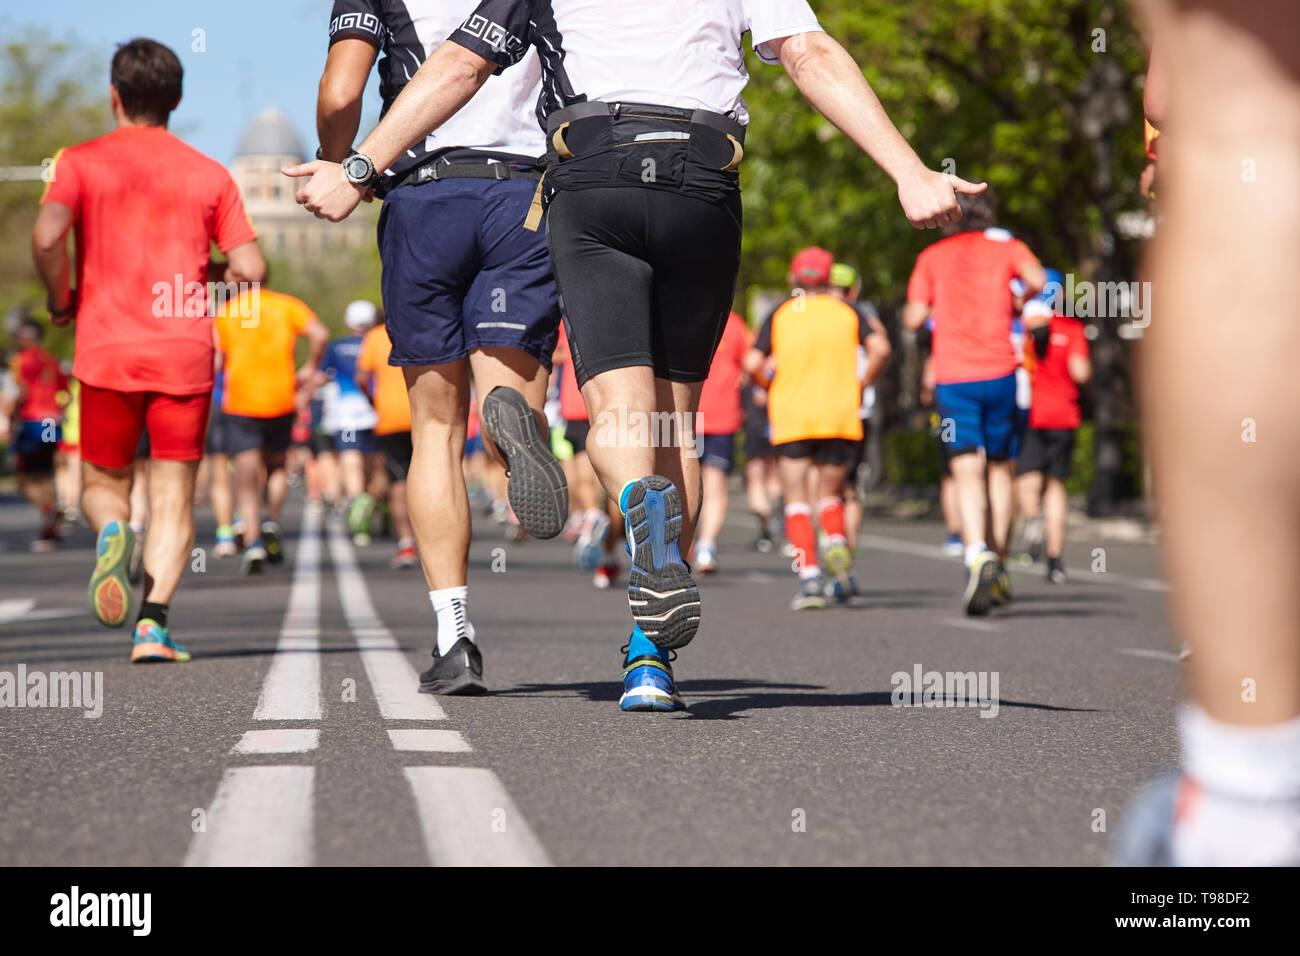 Marathon runners on the street. Healthy lifestyle. Athlete endurance - Stock Image